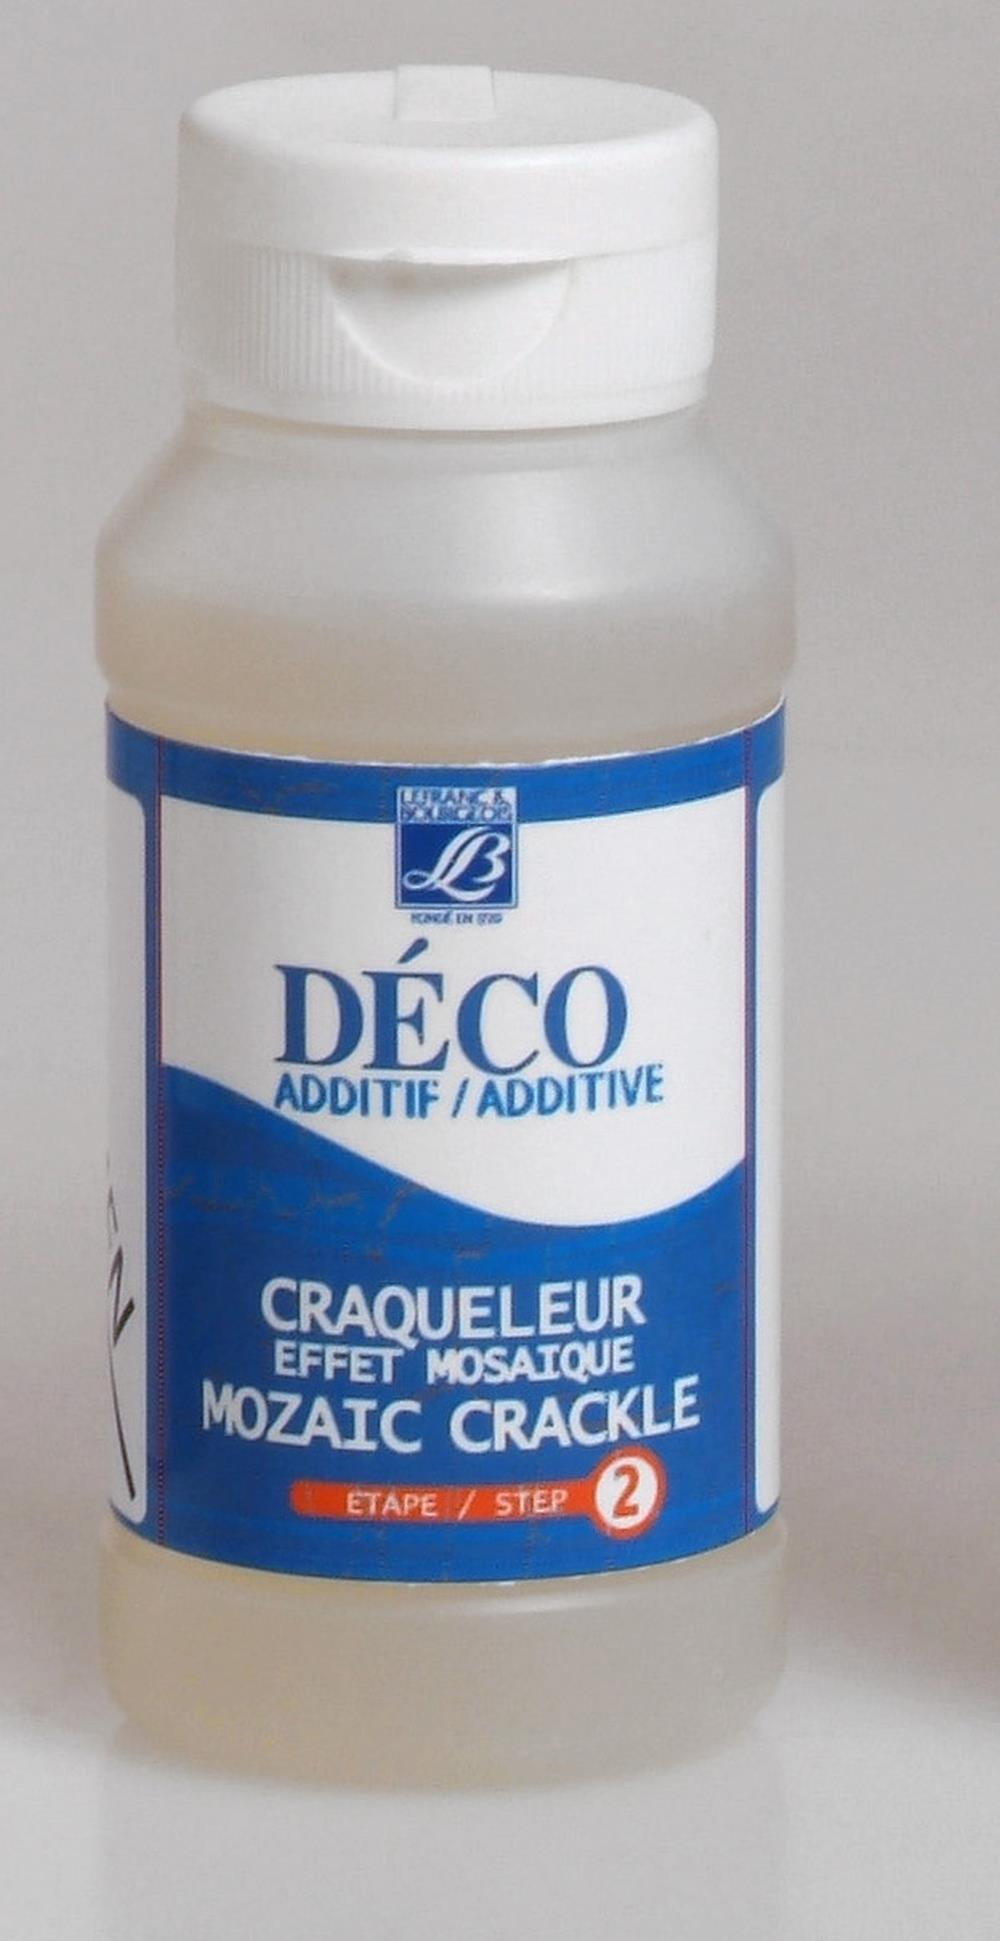 Hobbymedium L&B Deco Mosaik-krackelering steg 2, 120 ml